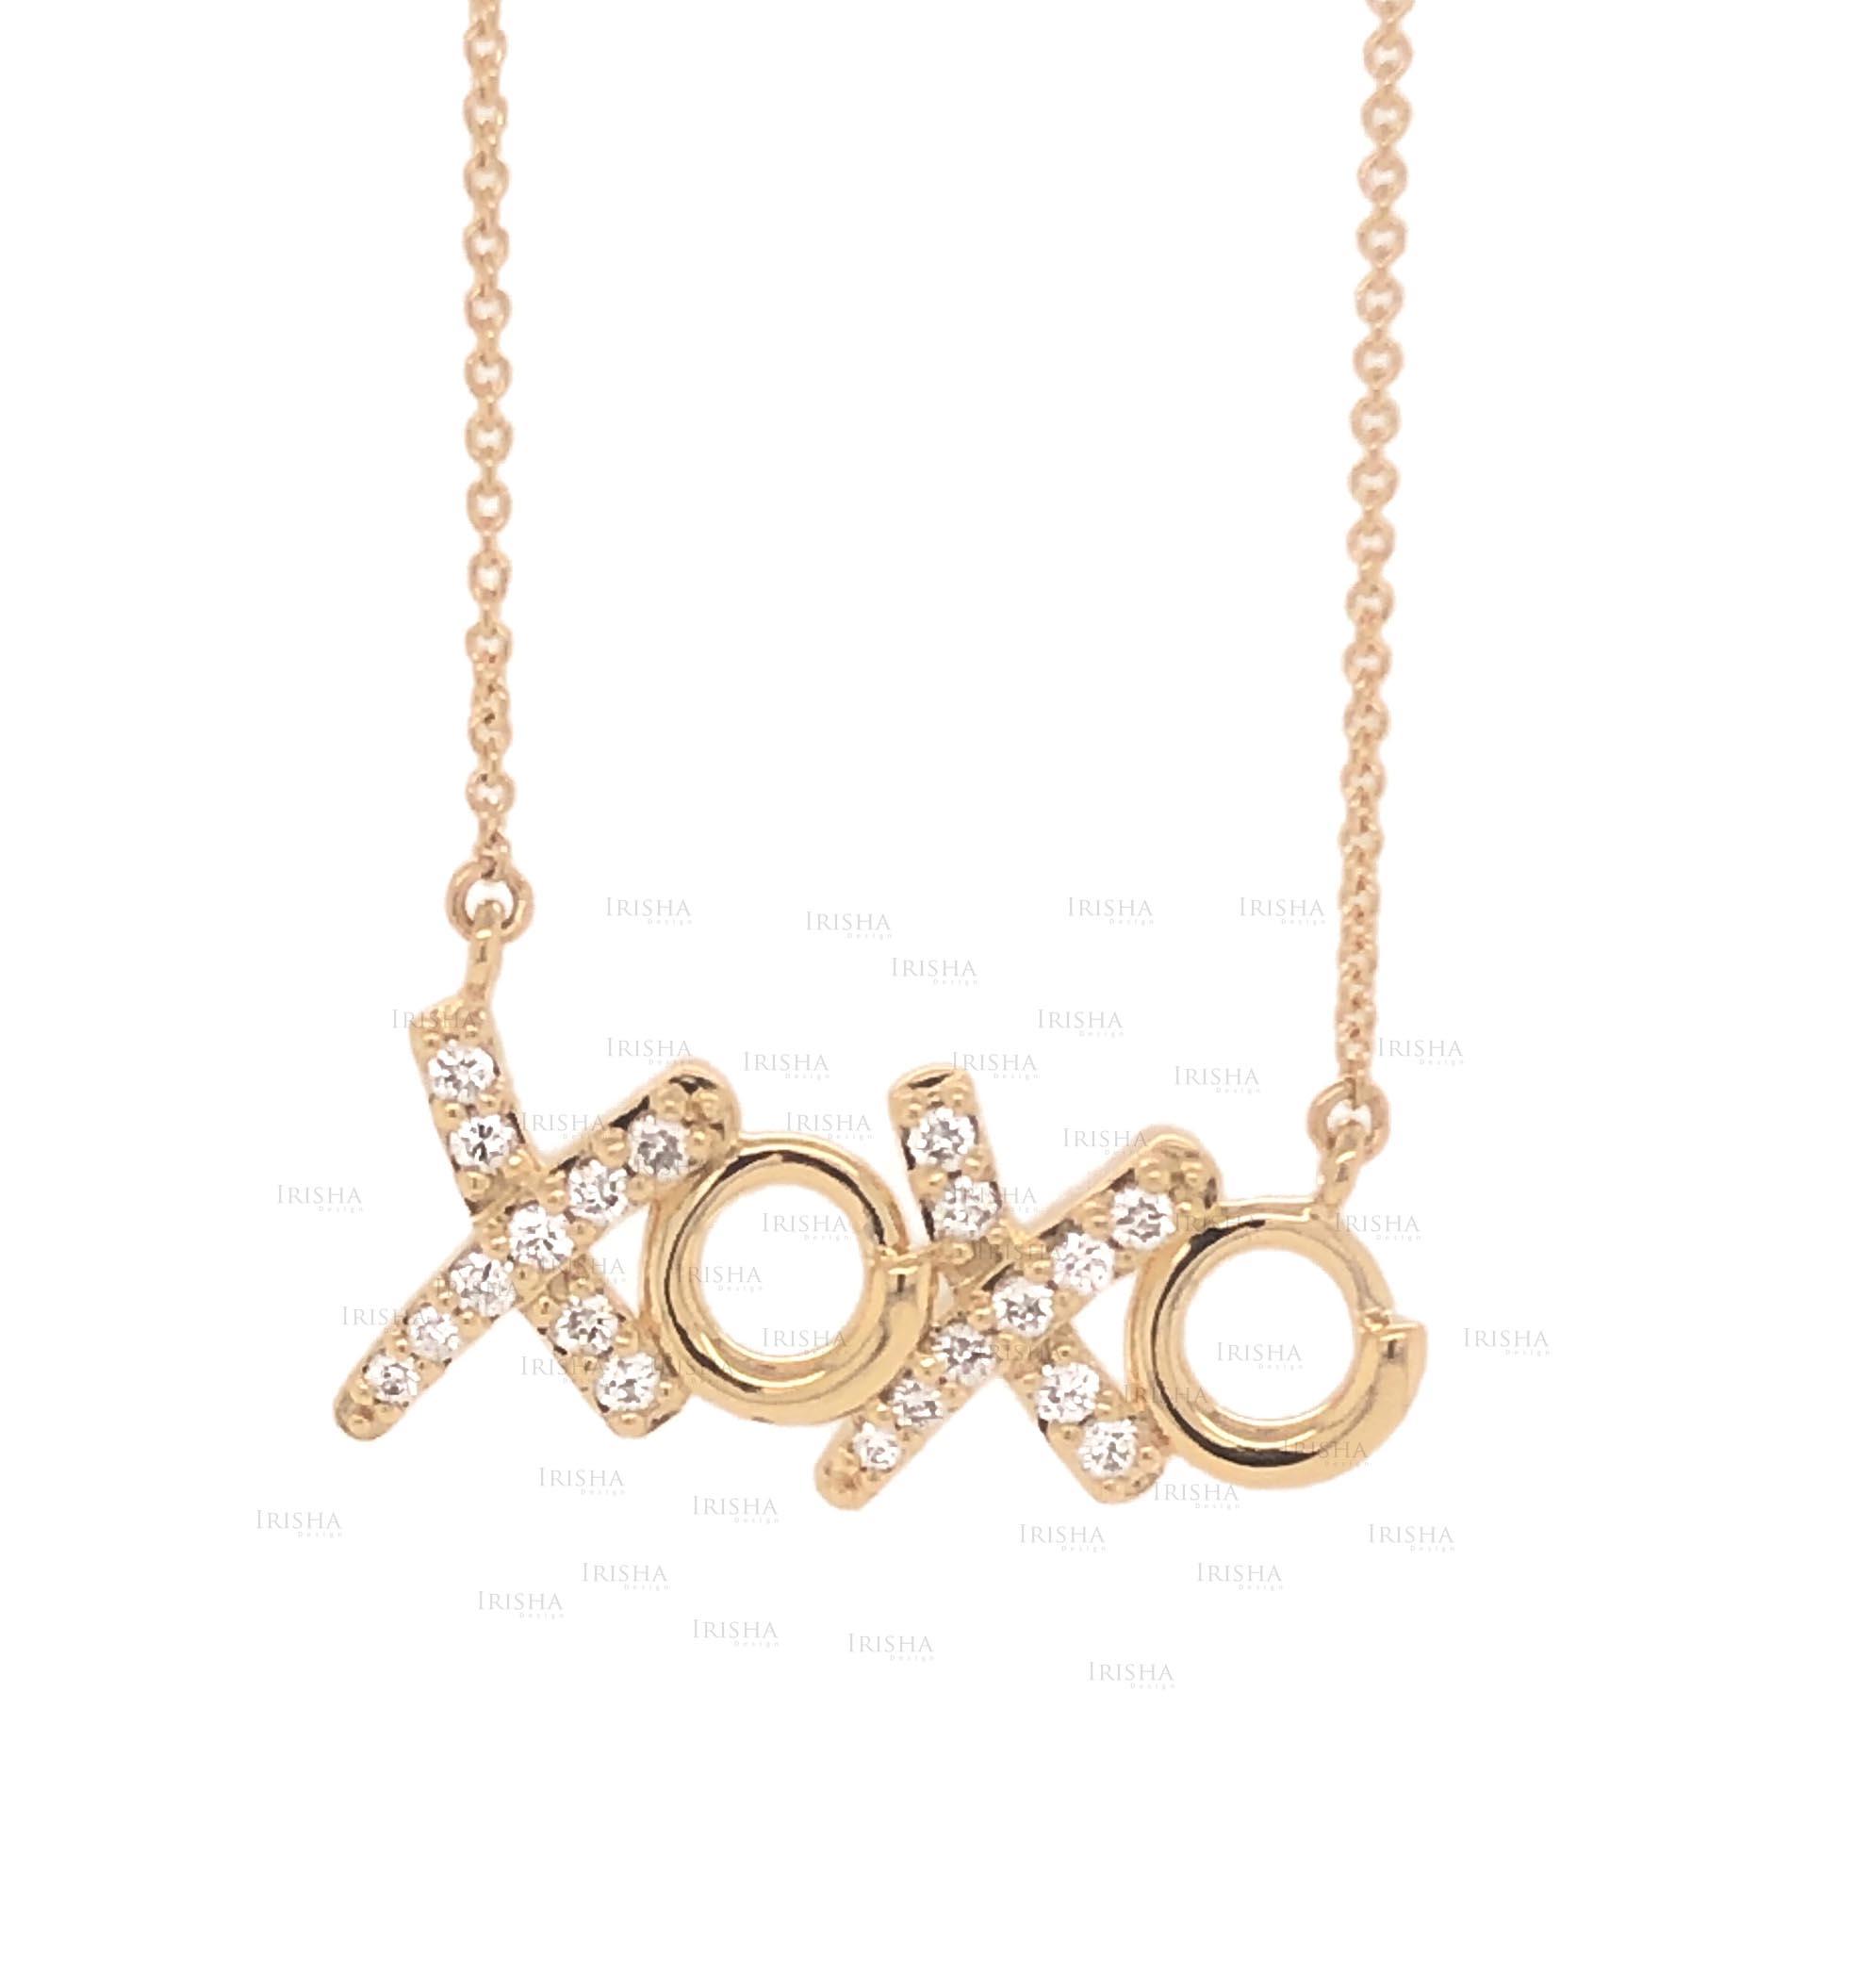 XOXO Pendant Necklace 0.15 Ct. Genuine Diamond 18K Gold Gift